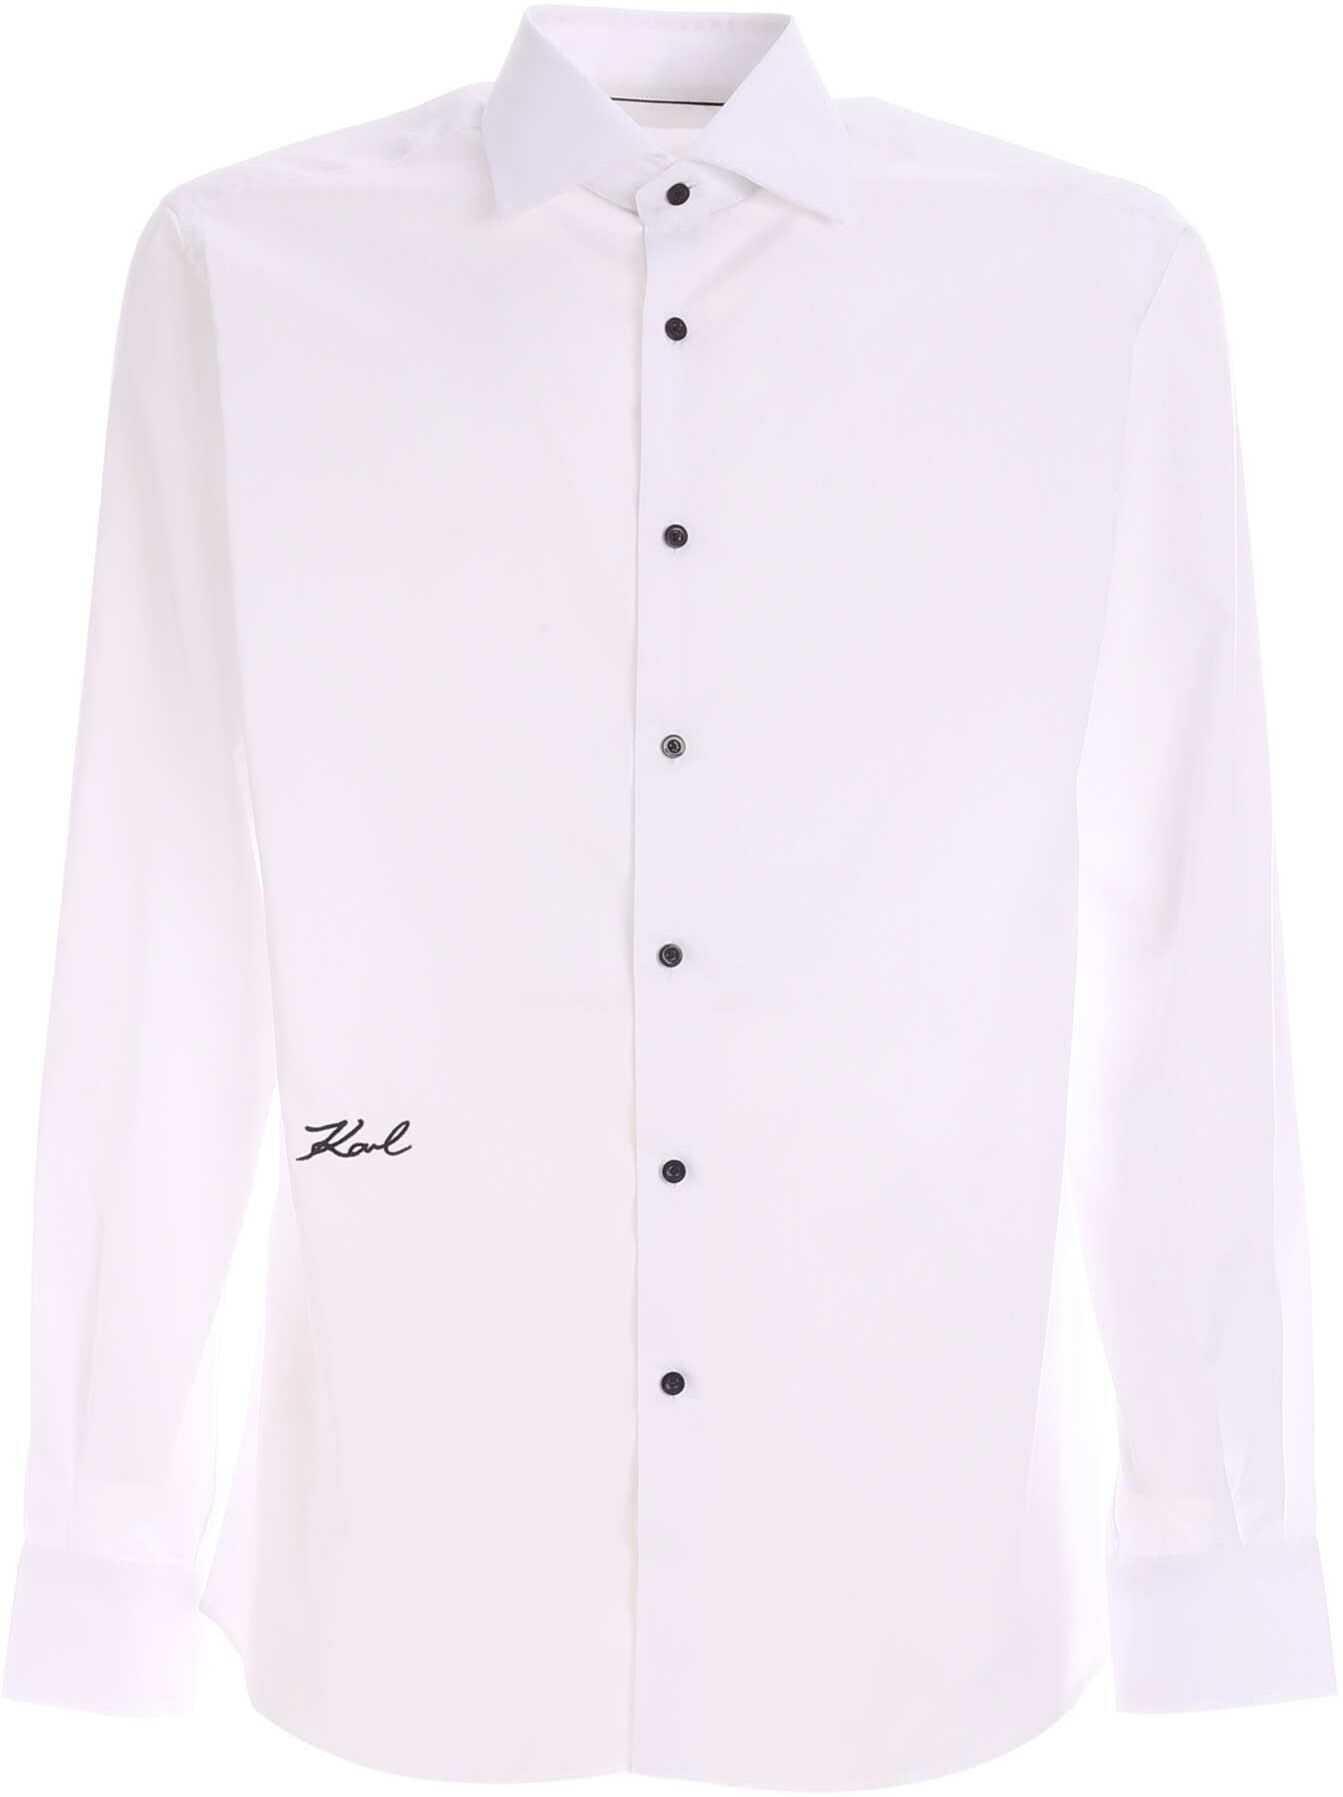 Karl Lagerfeld Signature Logo Shirt In White White imagine